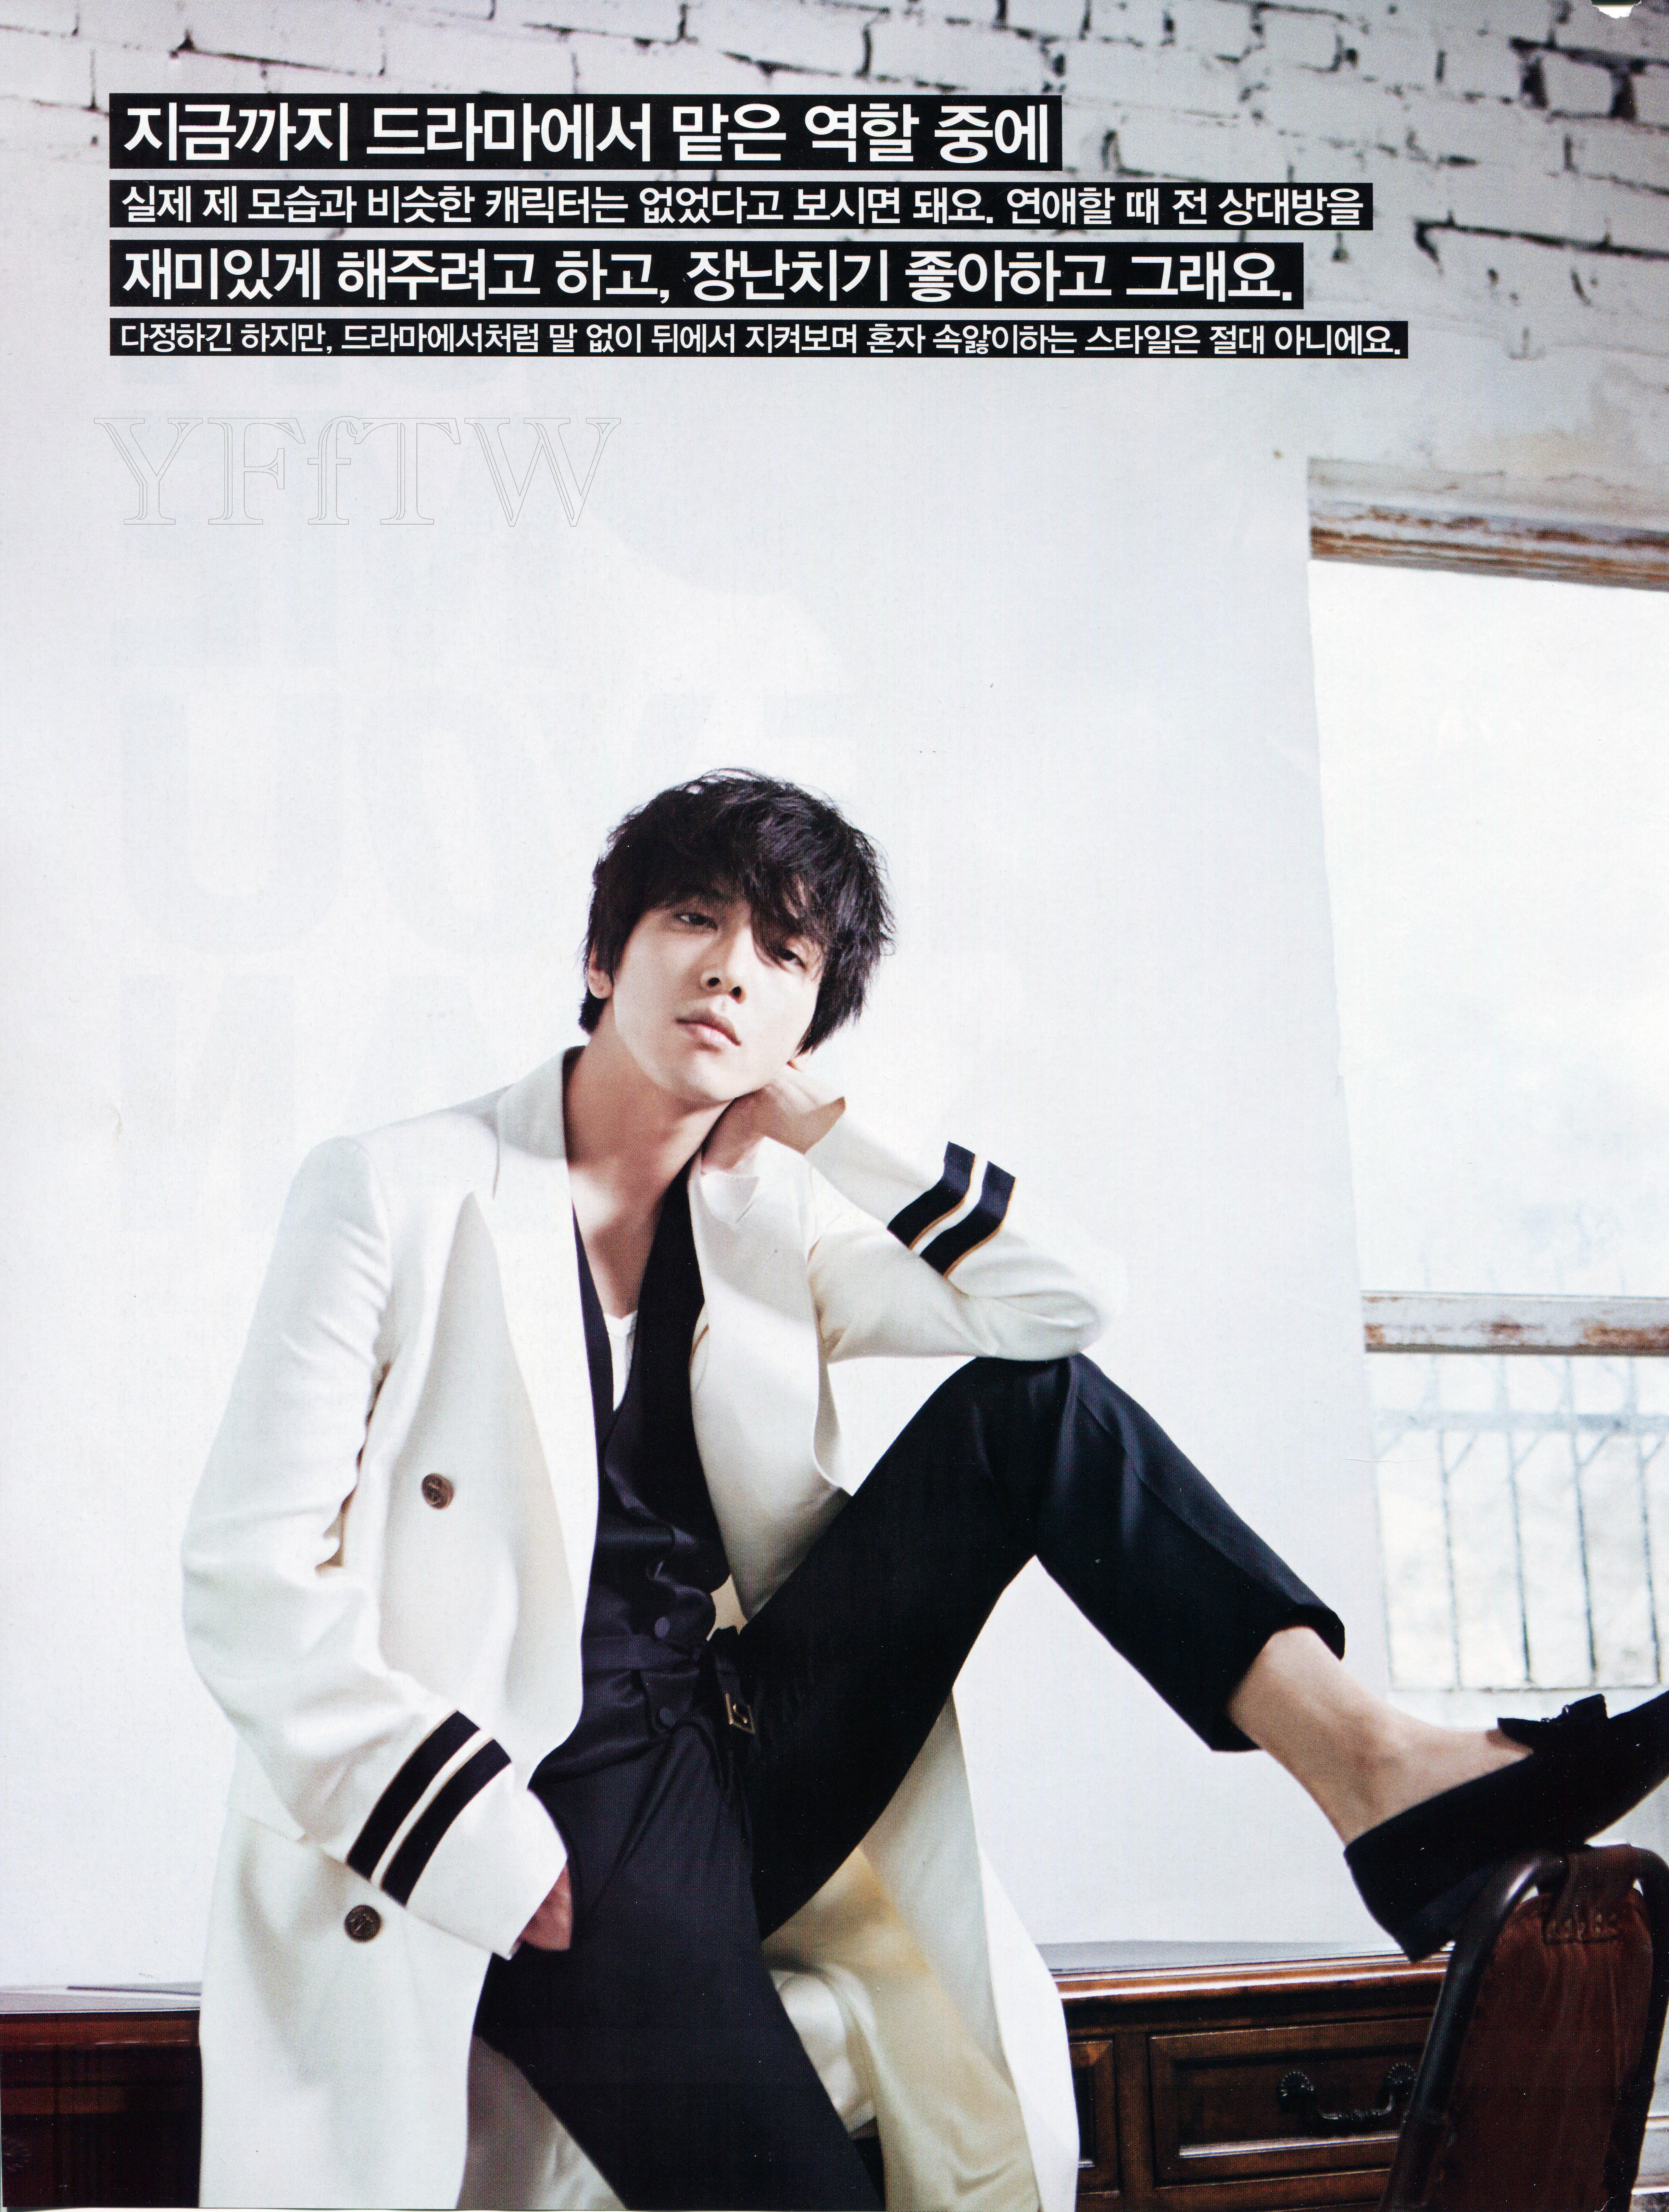 [Scans] Cosmopolitan Magazine (février 2015) Cosmopolita_2015e5b9b42e69c88e8999f-3